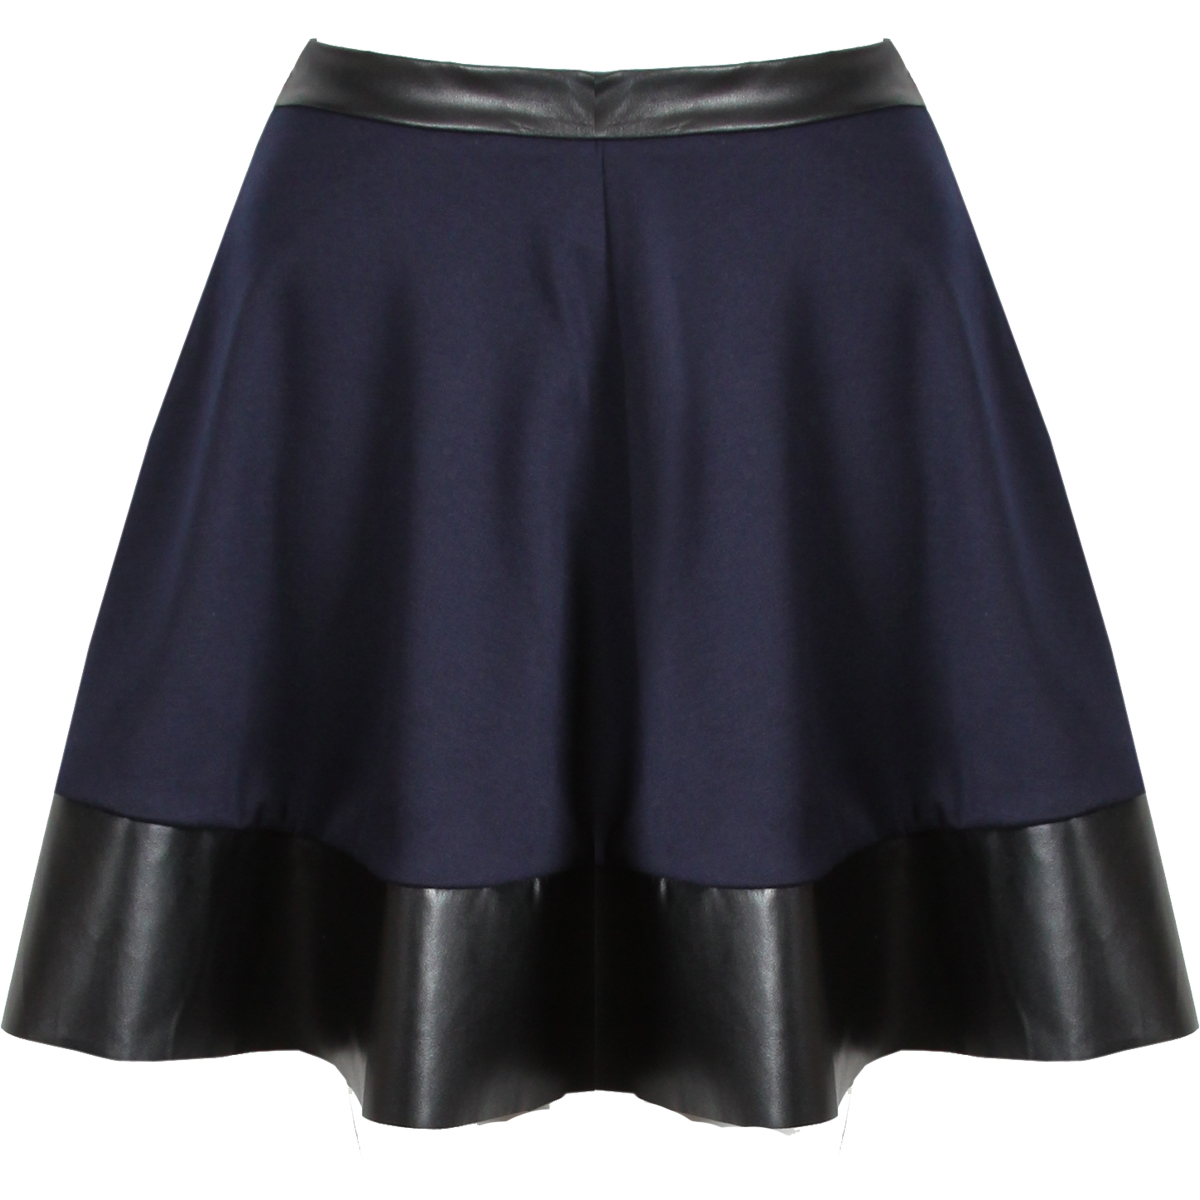 new womens navy blue pu leather trim skater skirt mini